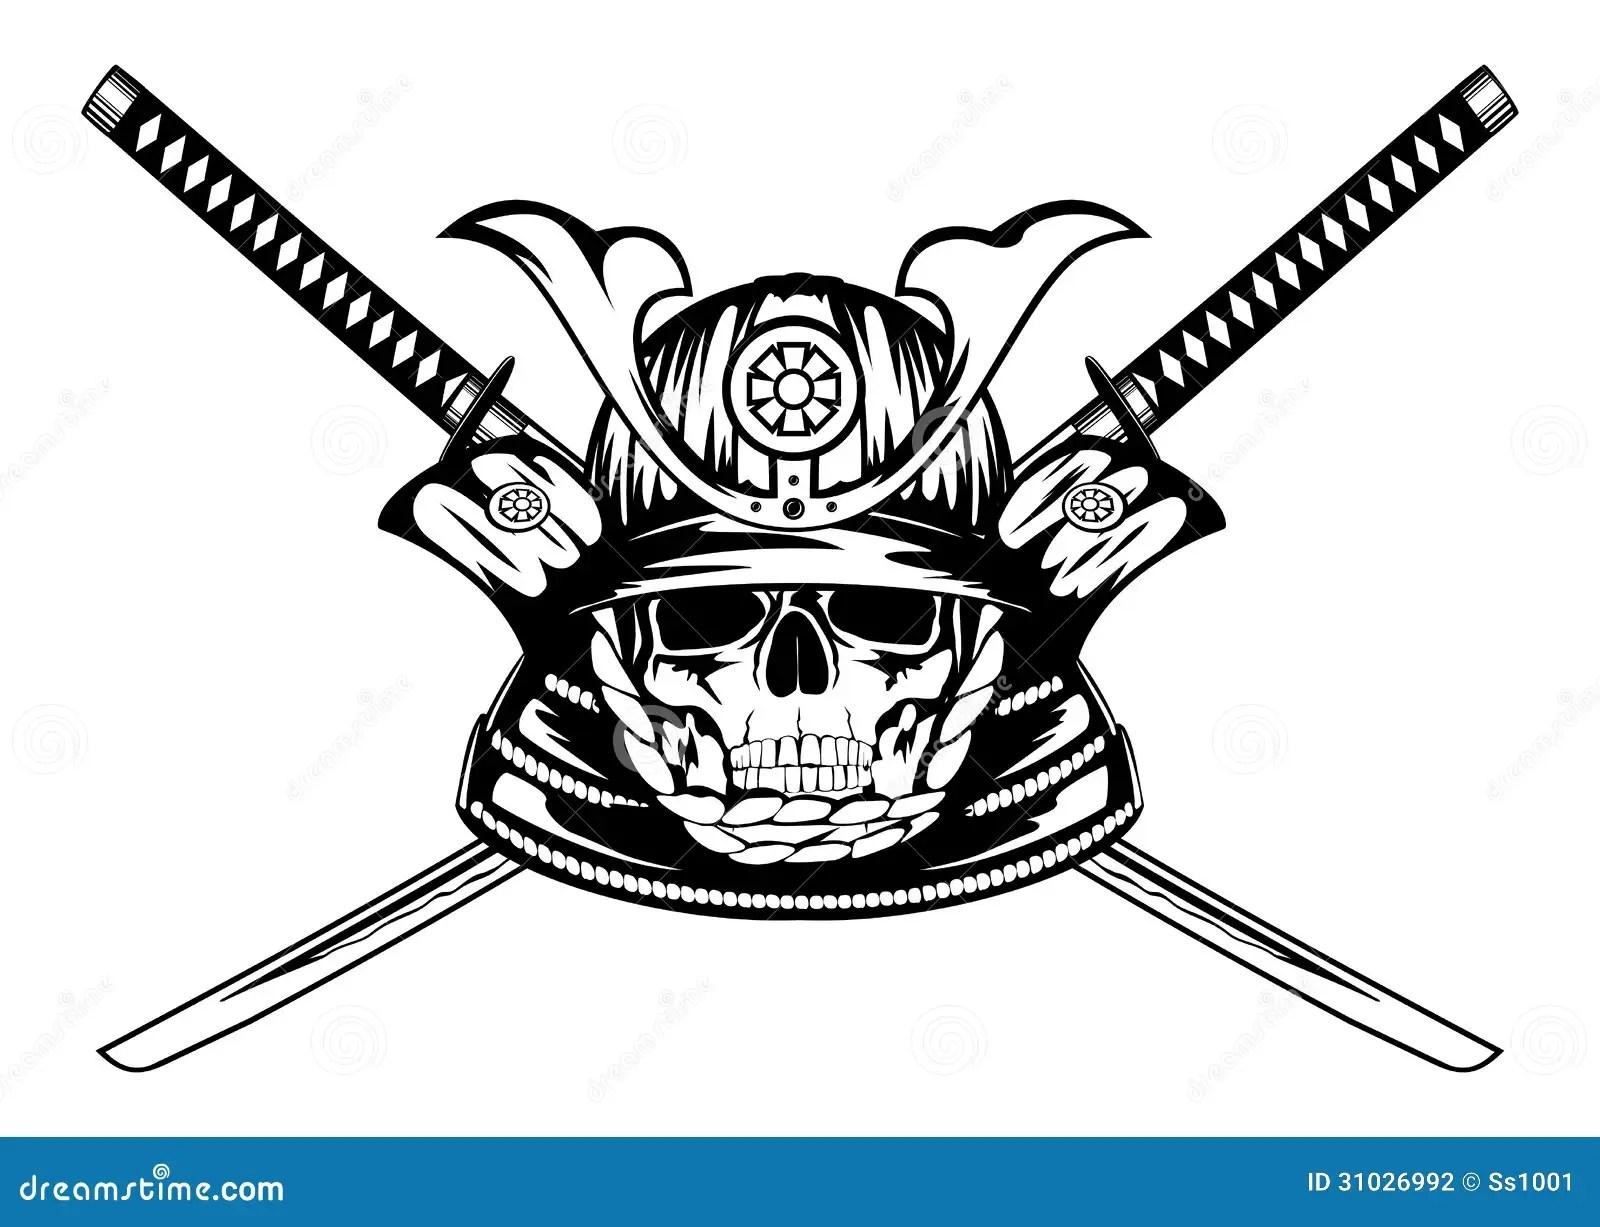 Skull In Samurai Helmet And Crossed Katanas Stock